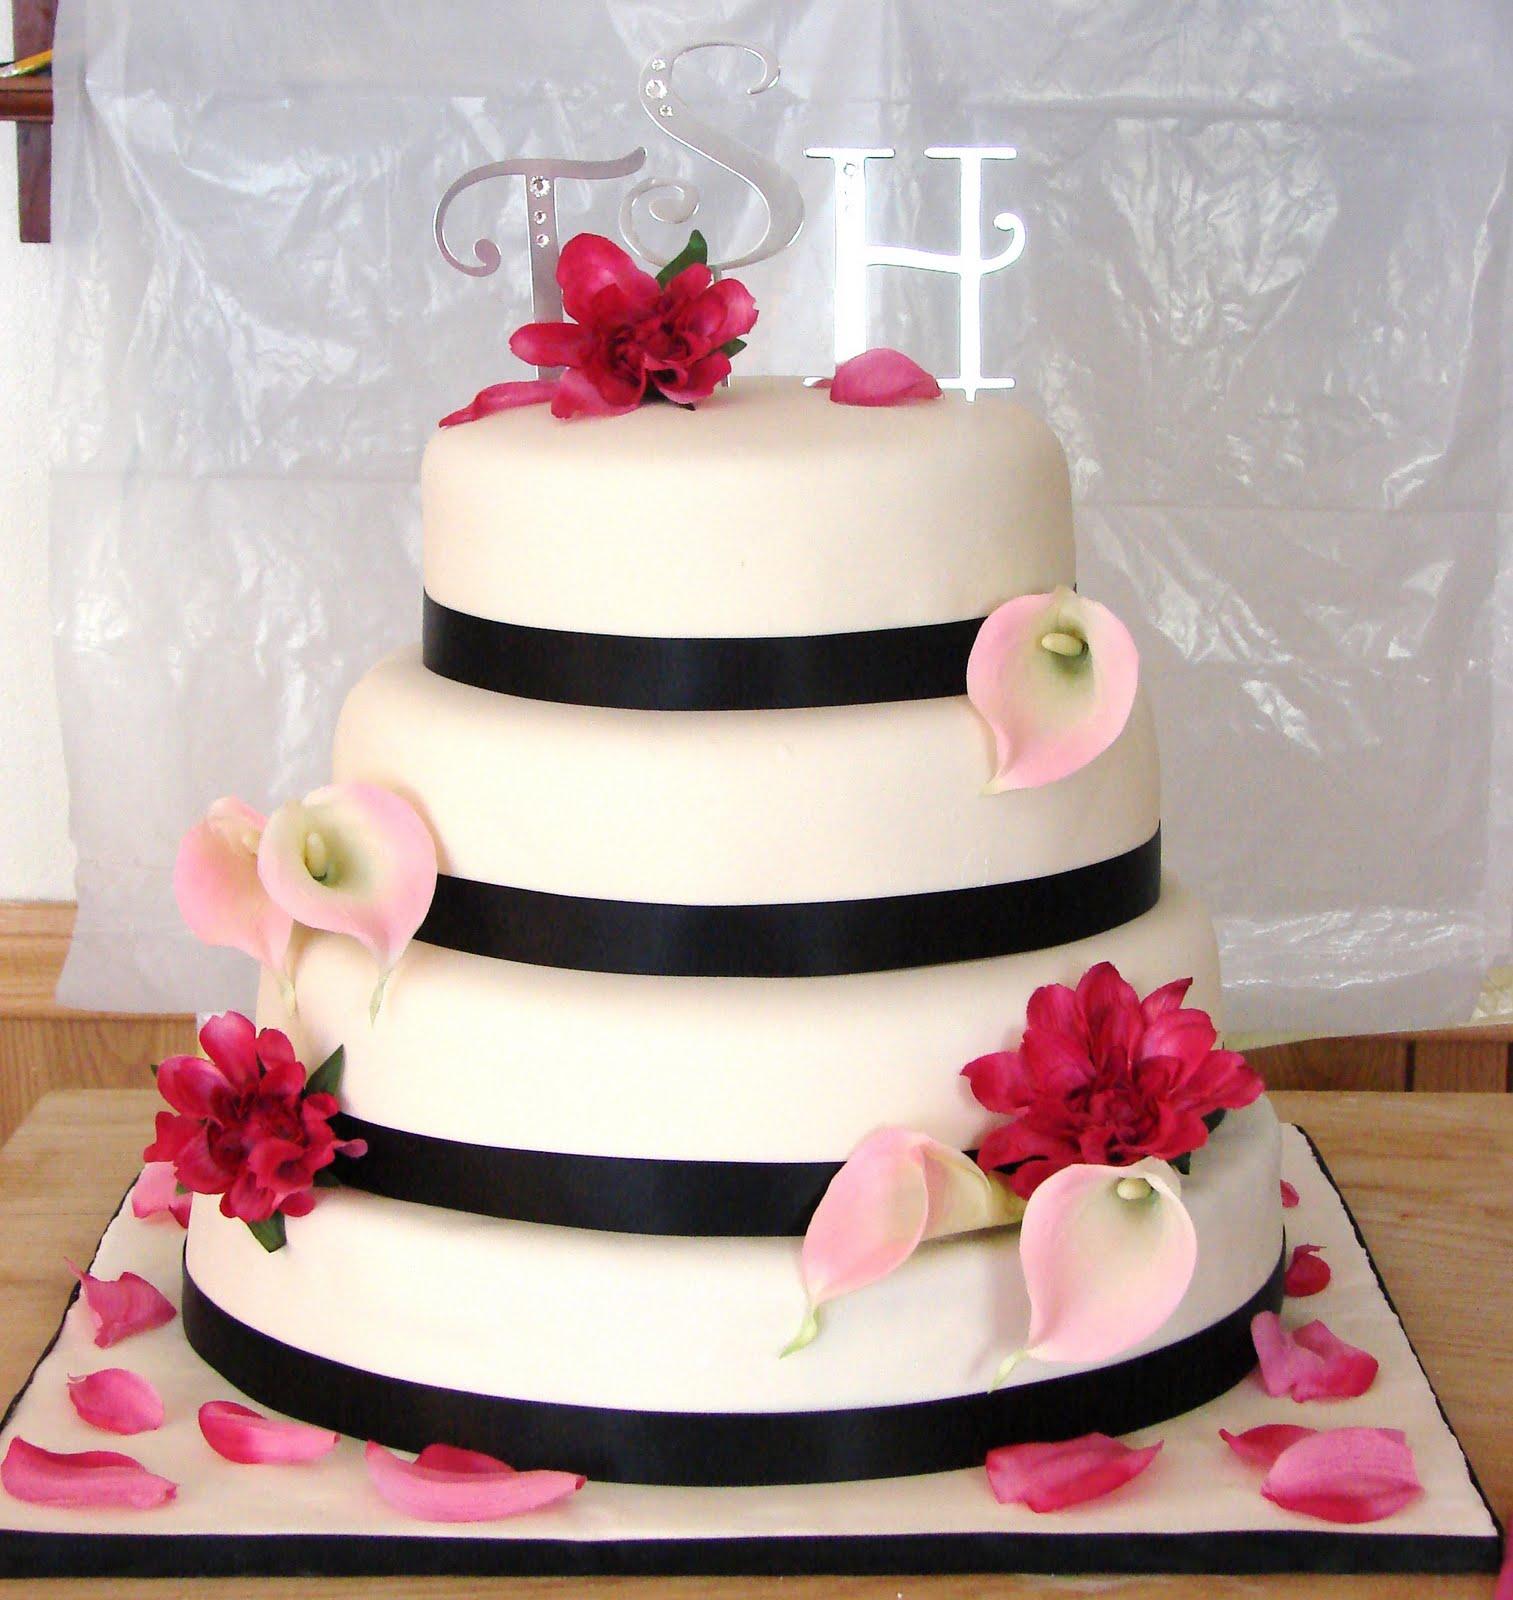 My Cake Hobby: Pink and Black Wedding Cake